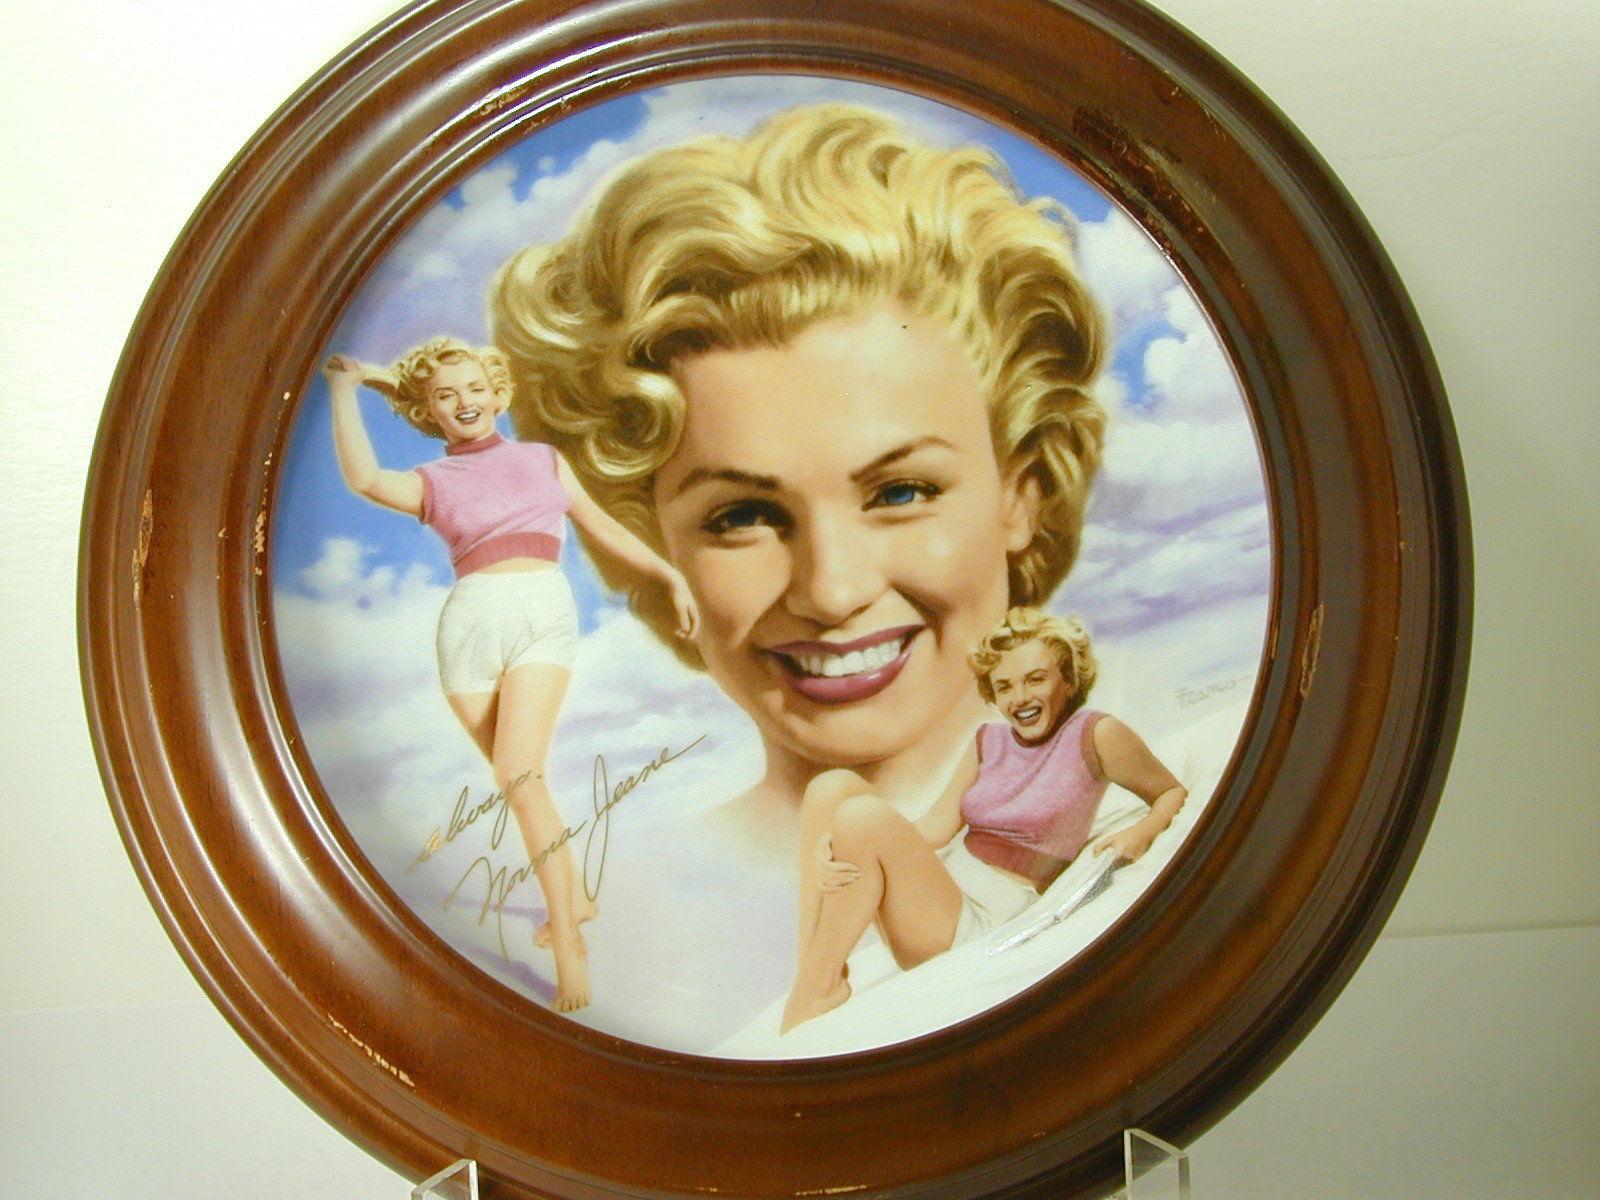 2598 THE GIRL NEXT DOOR Remembering Norma Jeane Marilyn Monroe Hamilton plt 1994